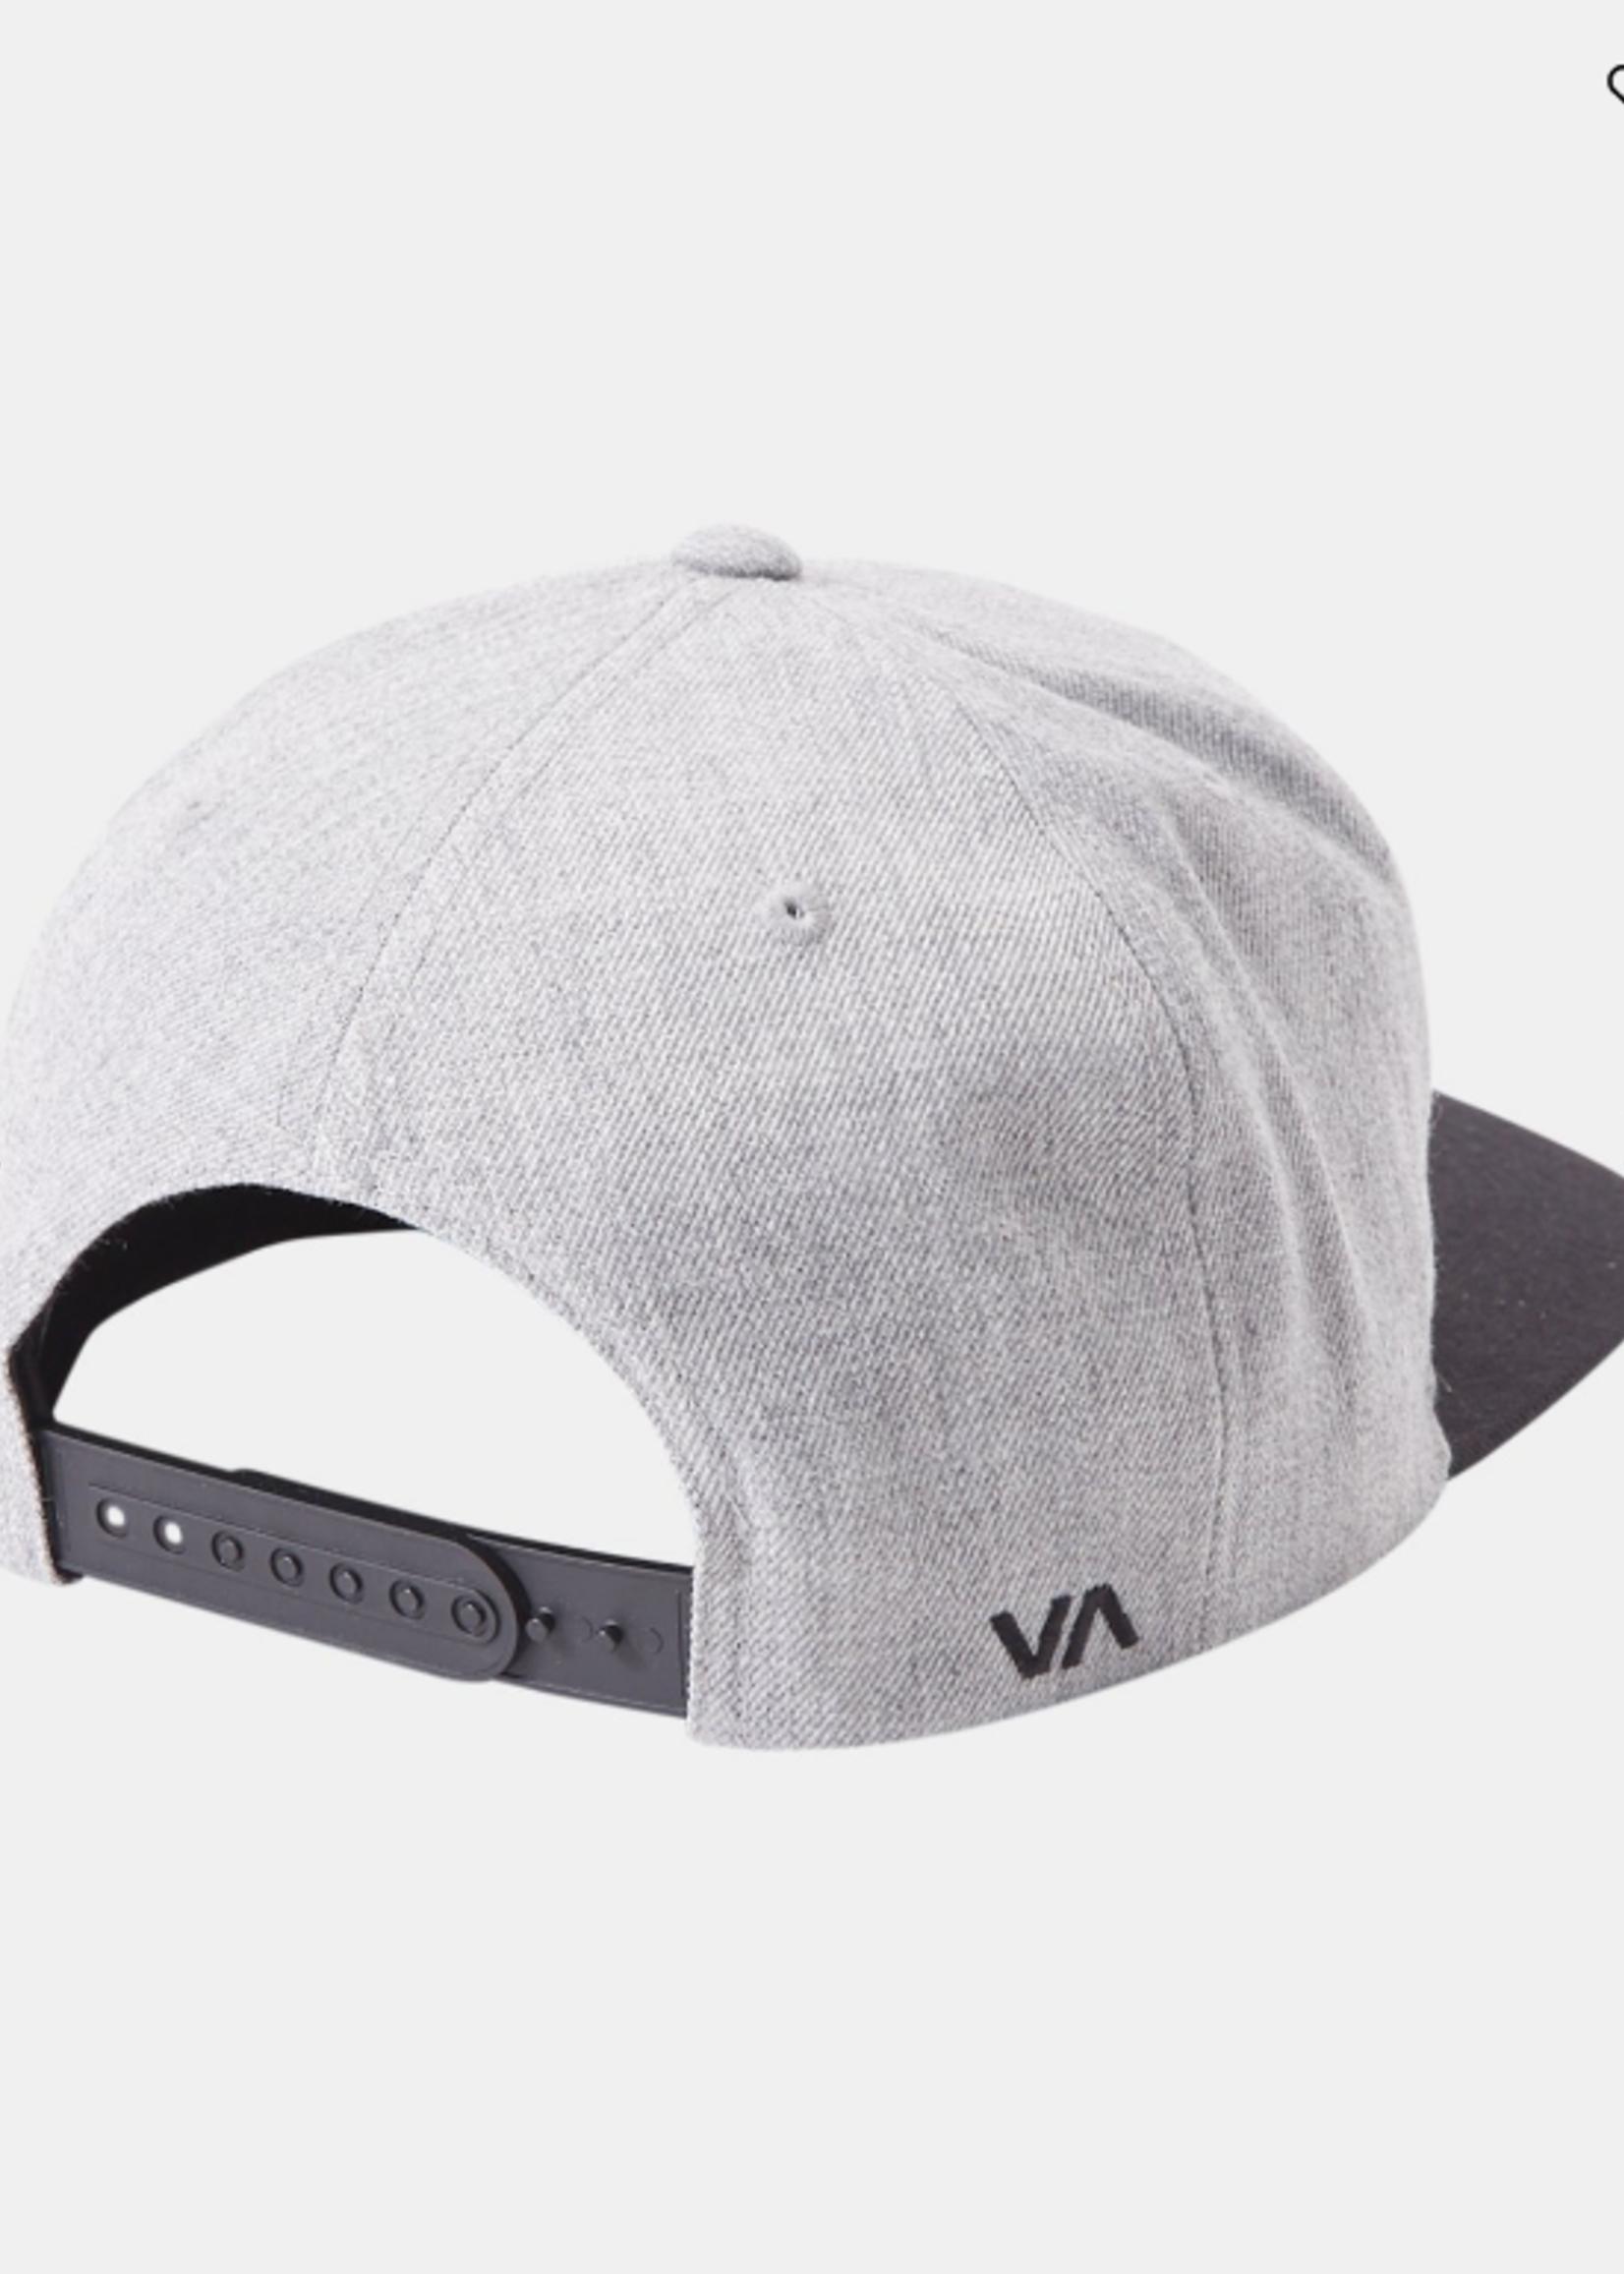 RVCA T Snap II Hat - Heather Grey/Black